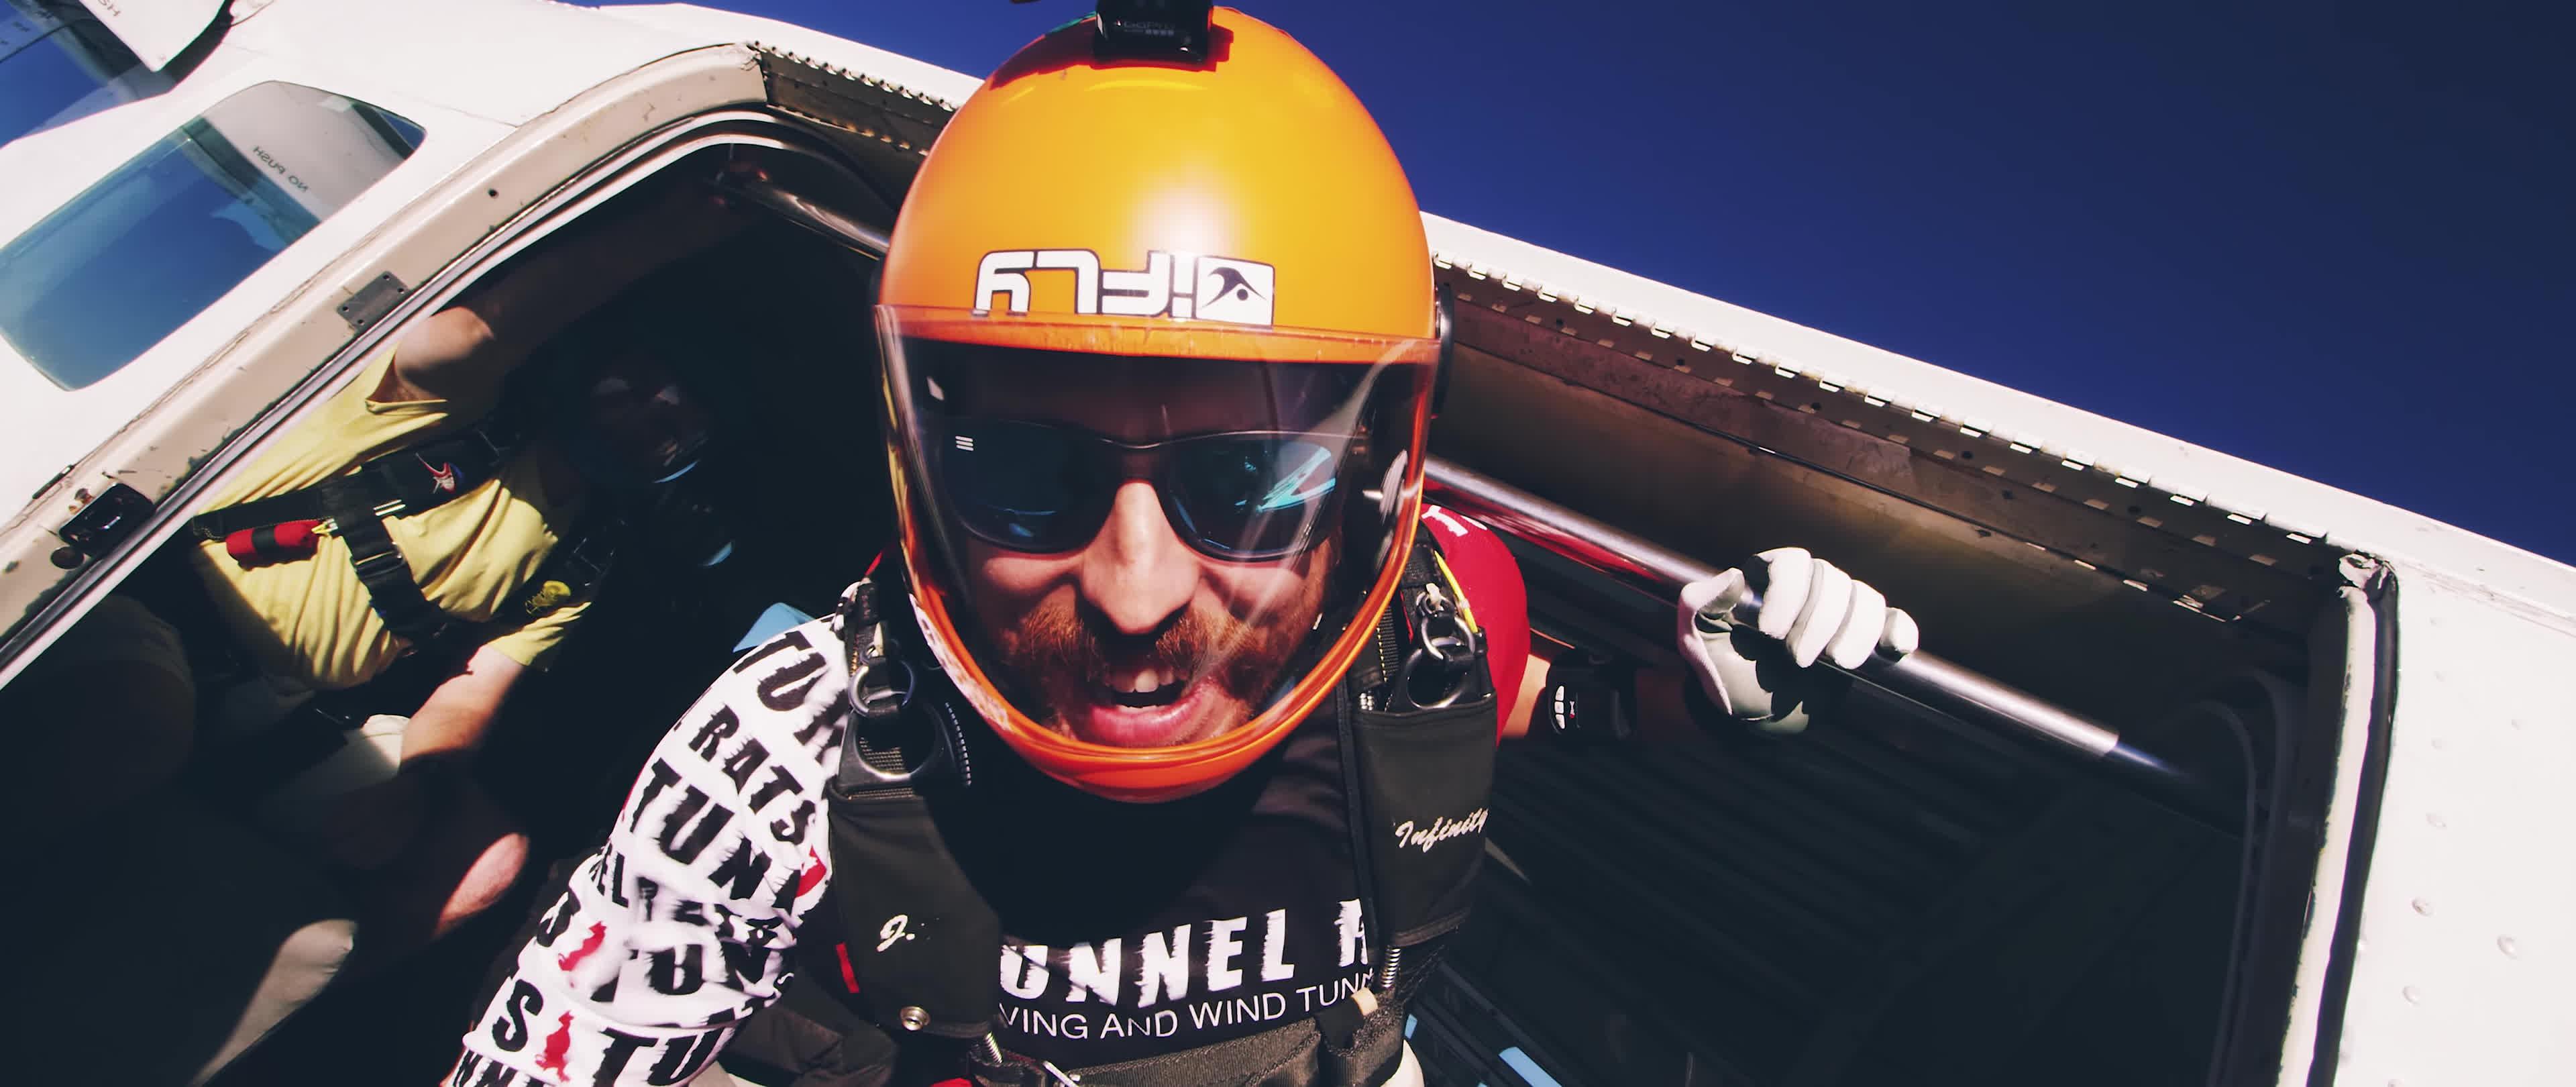 sky diving, skydive, skydiving, FREE FALL   Skydiving in 4K GIFs